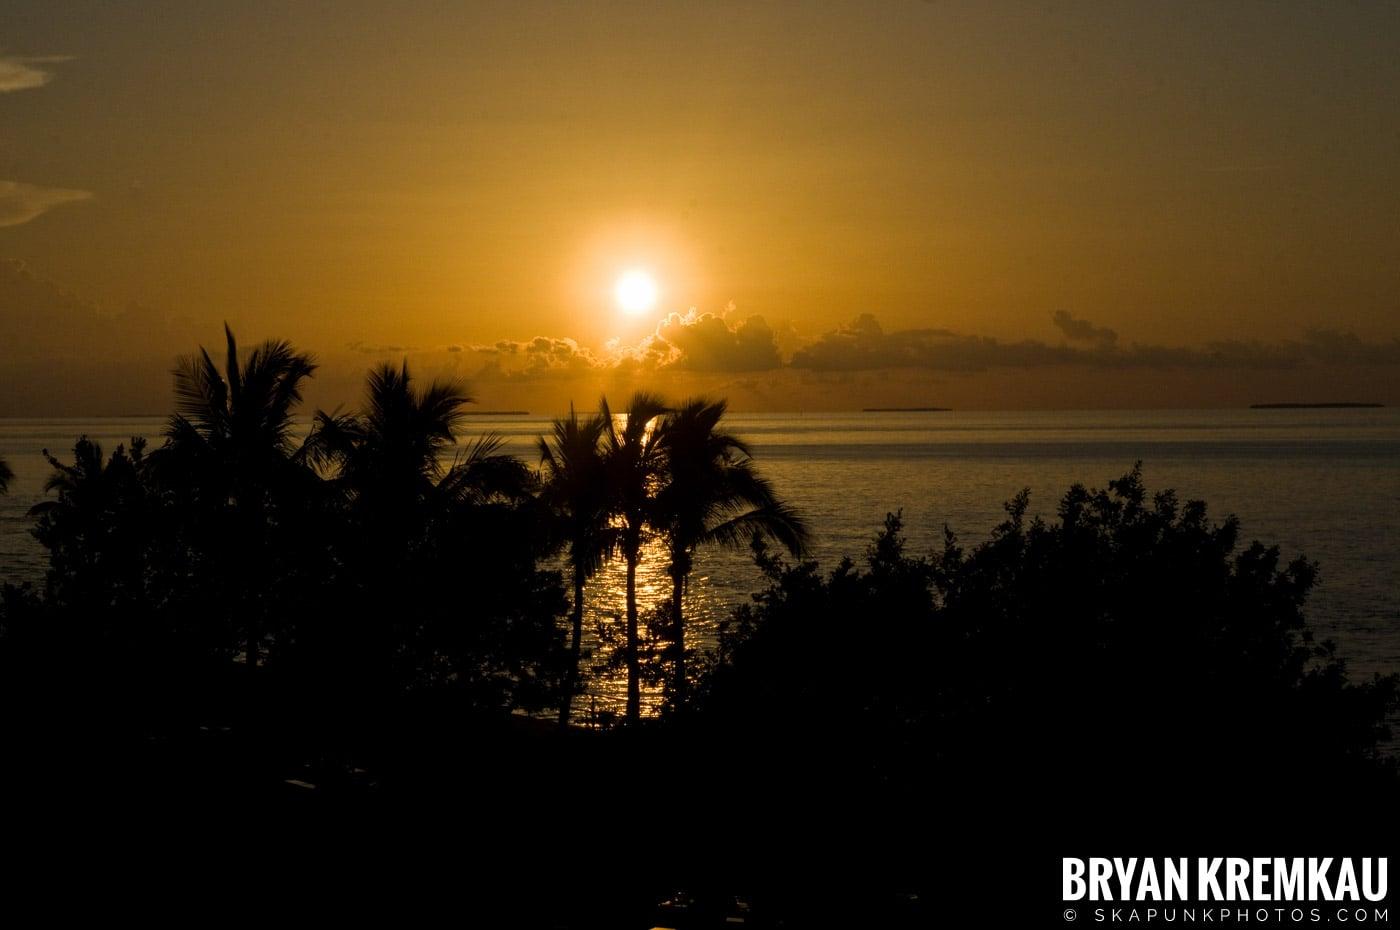 Florida Keys Vacation - 7.09.10 - 7.15.10 (83)